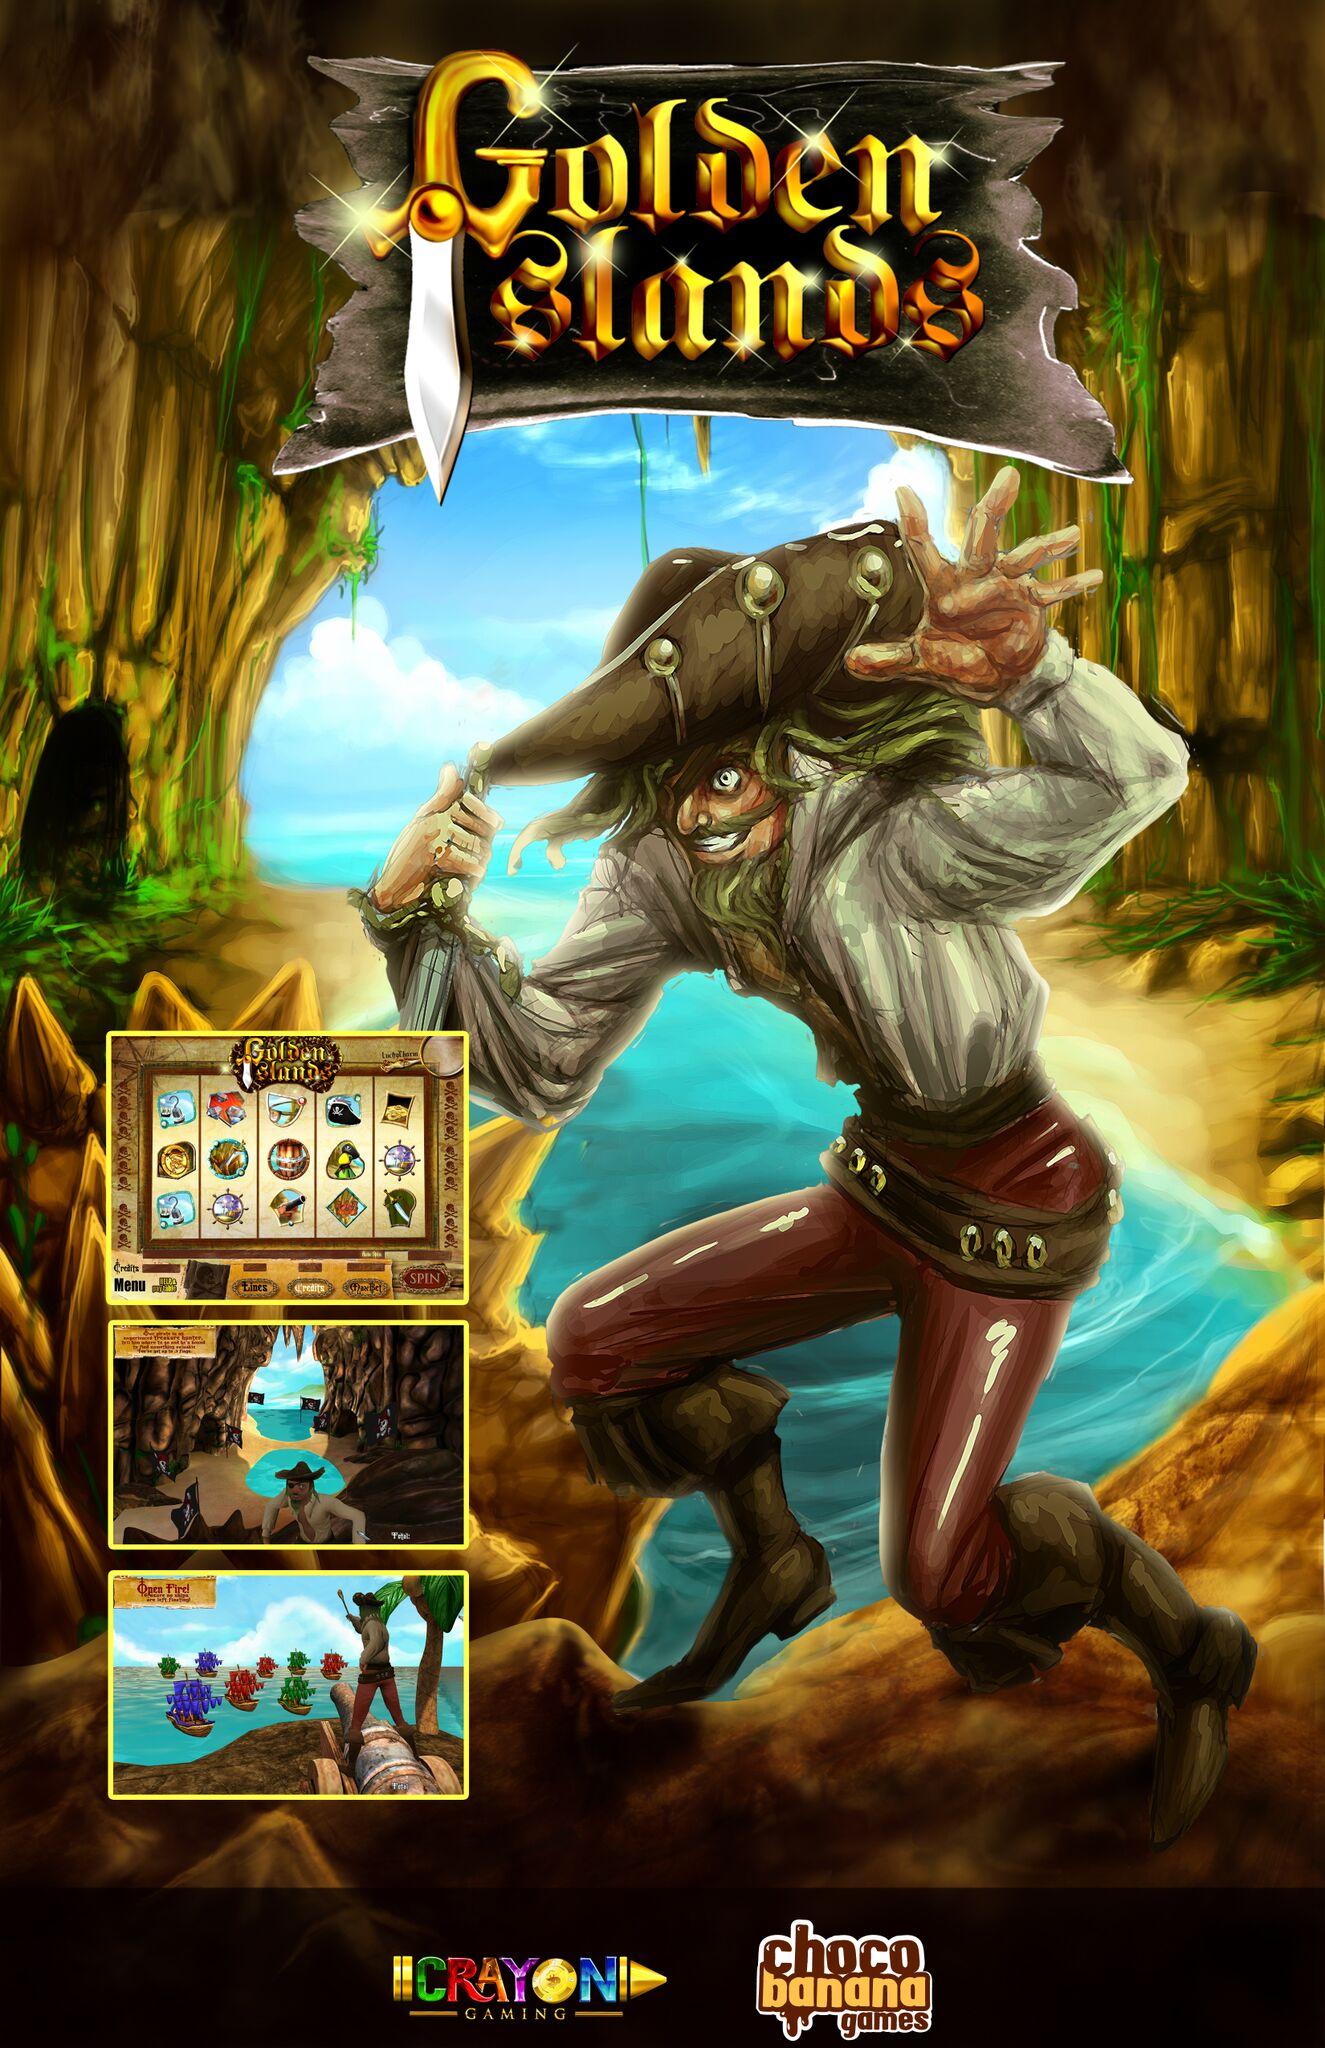 Pirate Gambling Games